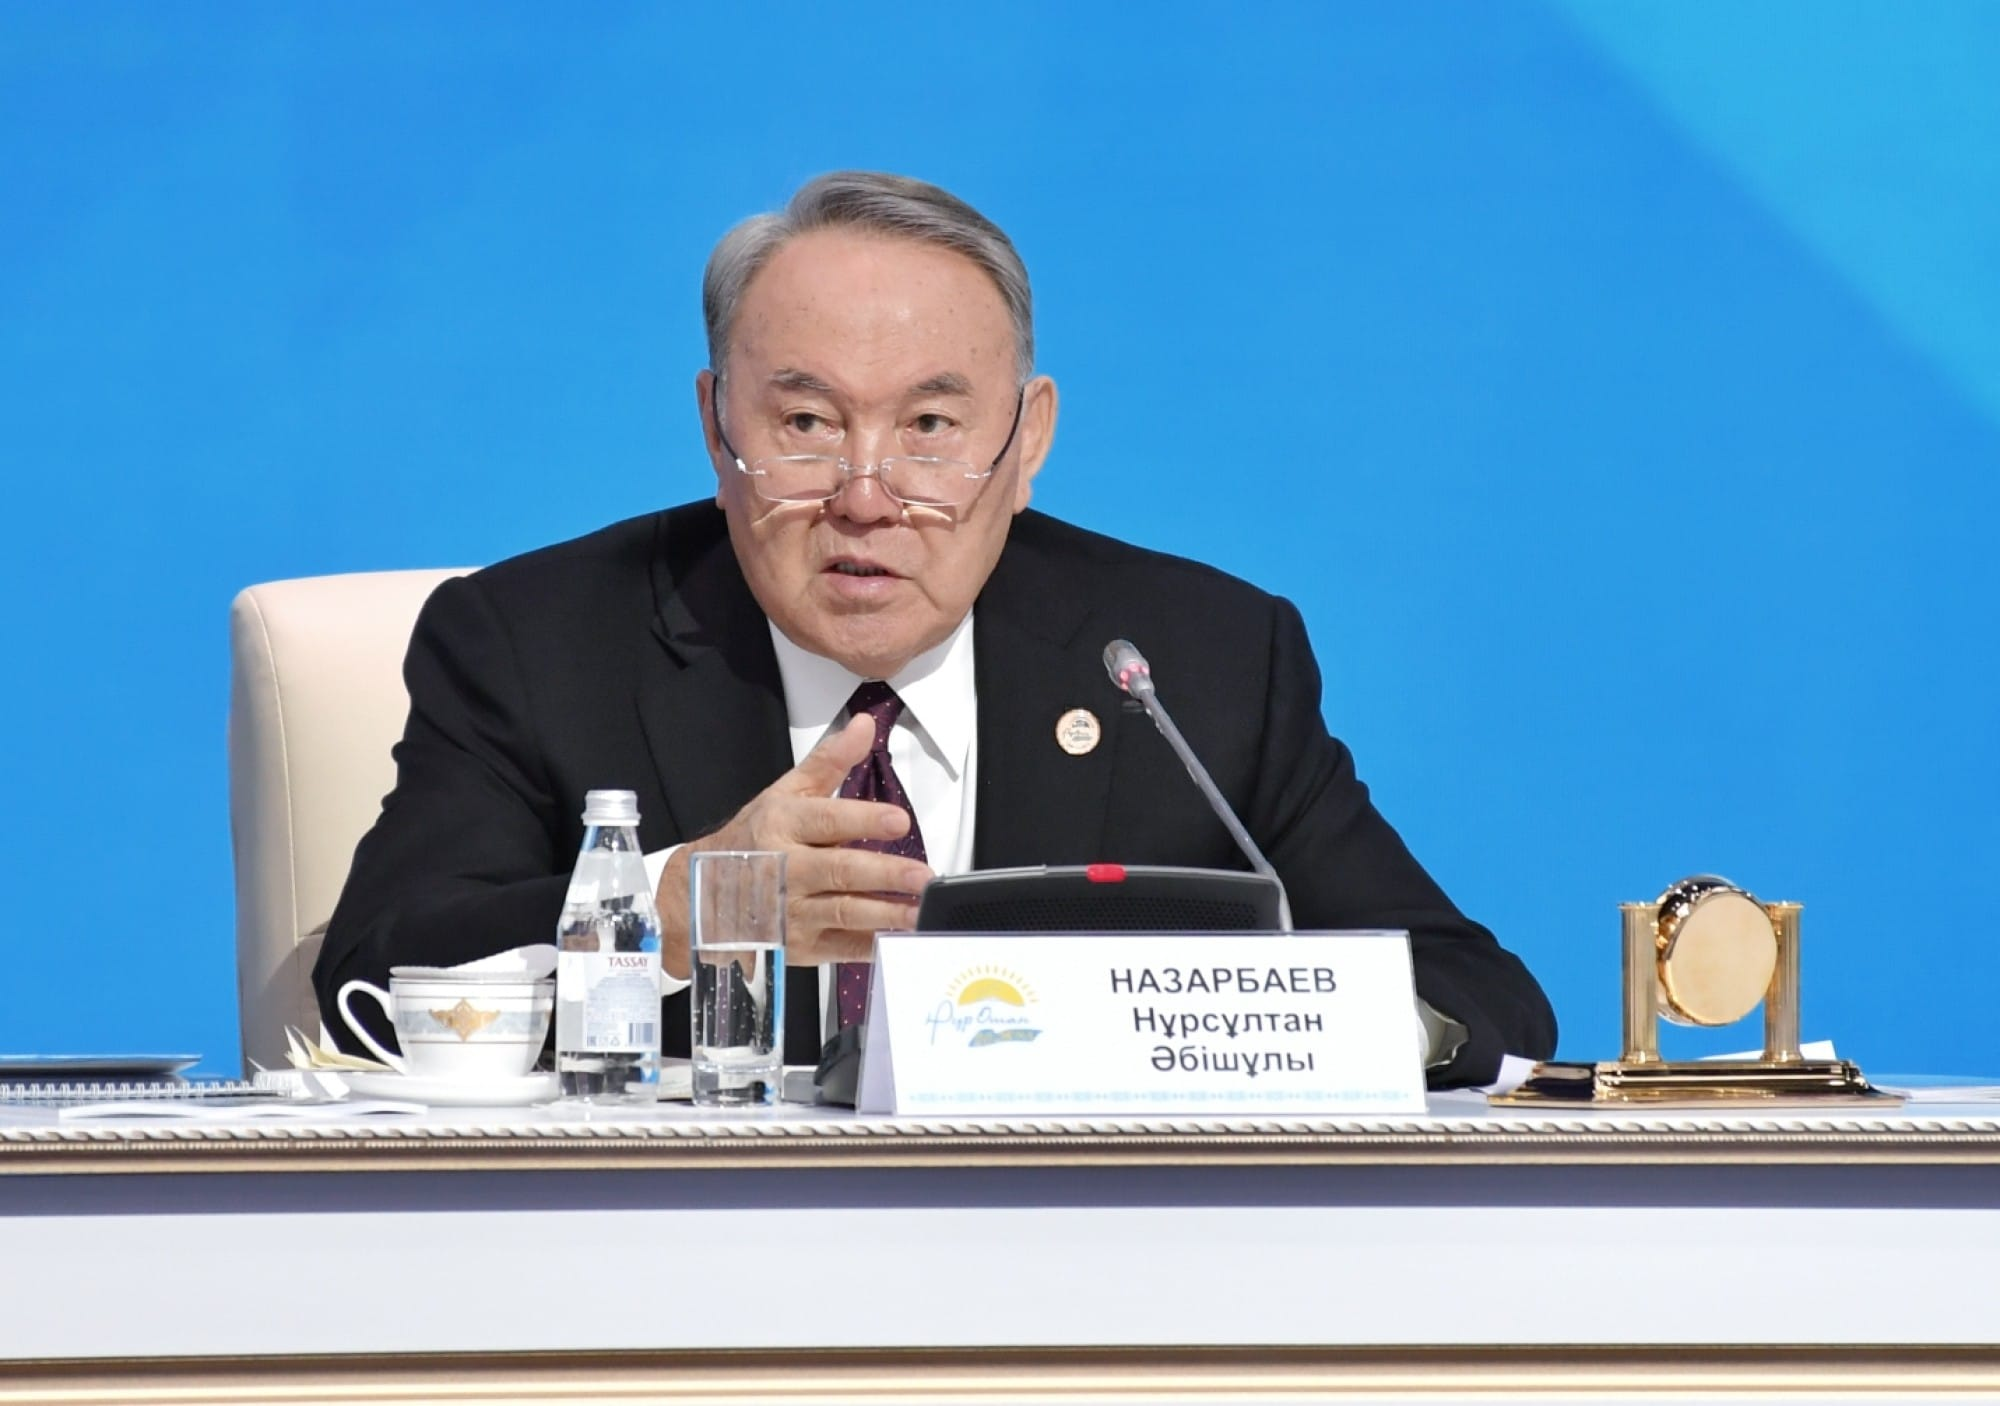 Нұрсұлтан Назарбаев съезд